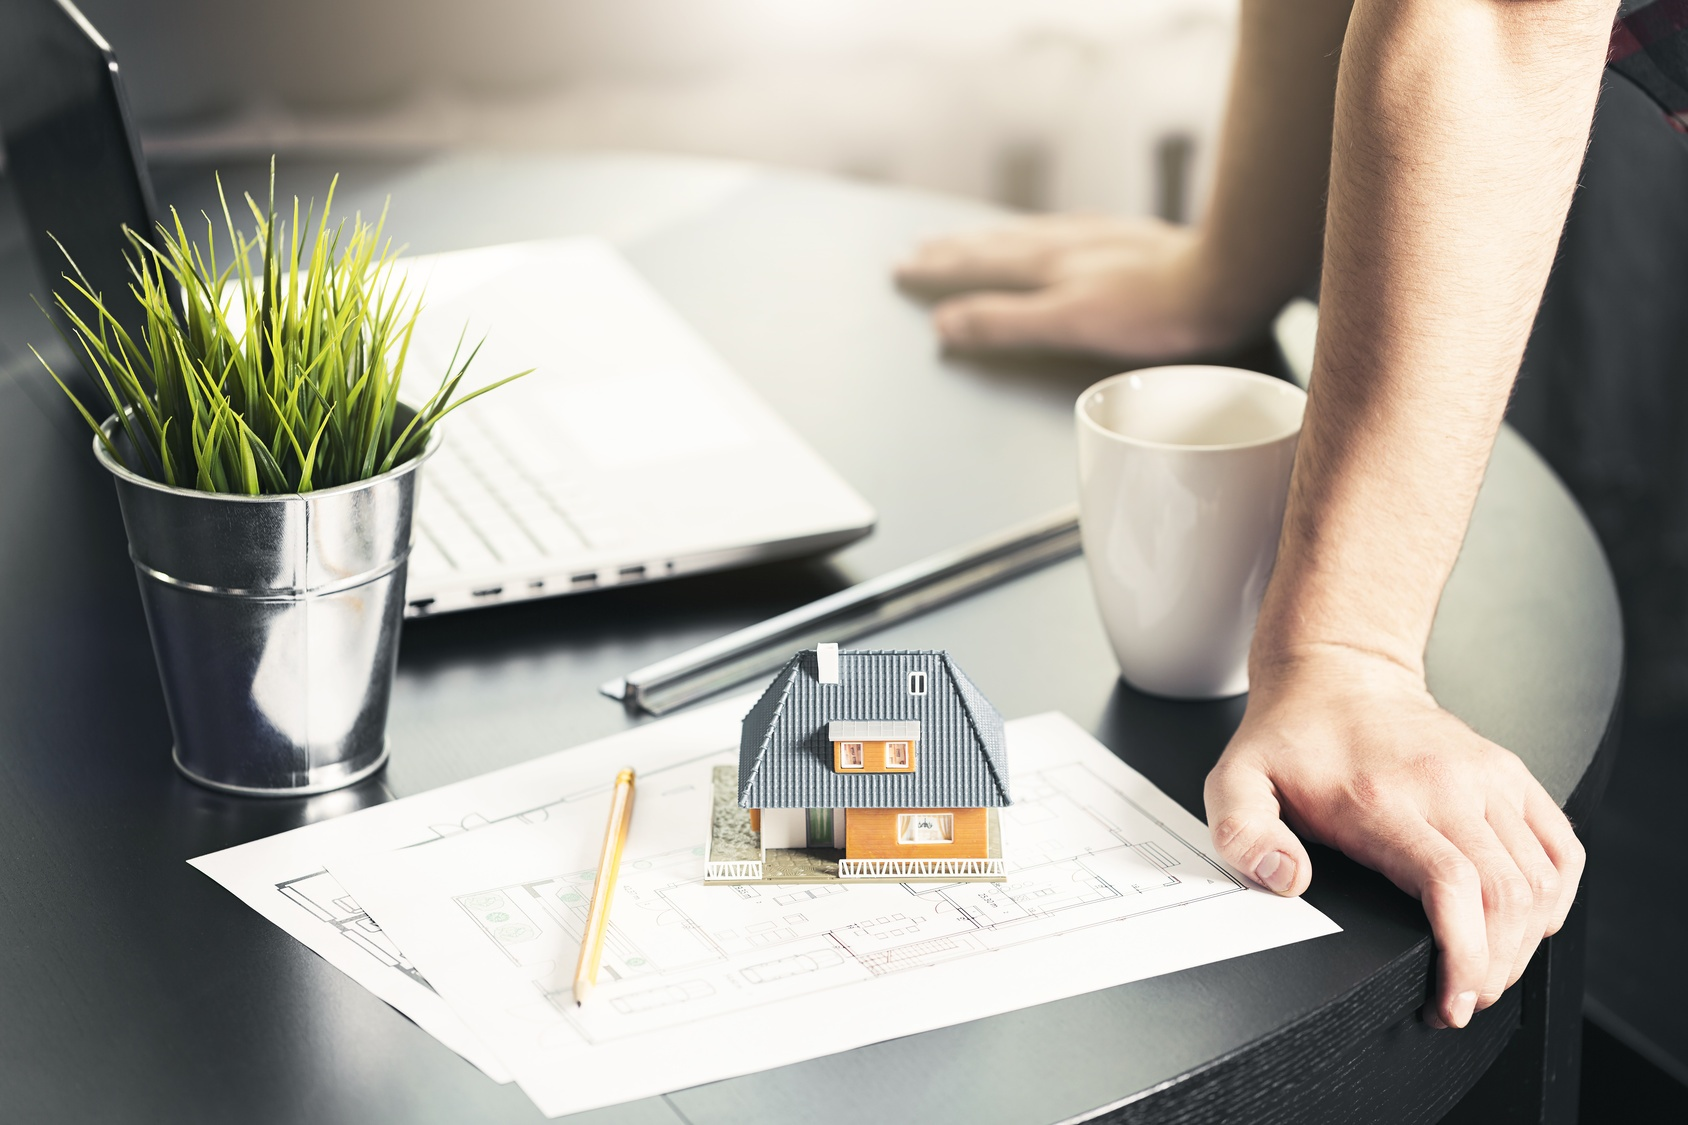 Model house and blueprints on desk